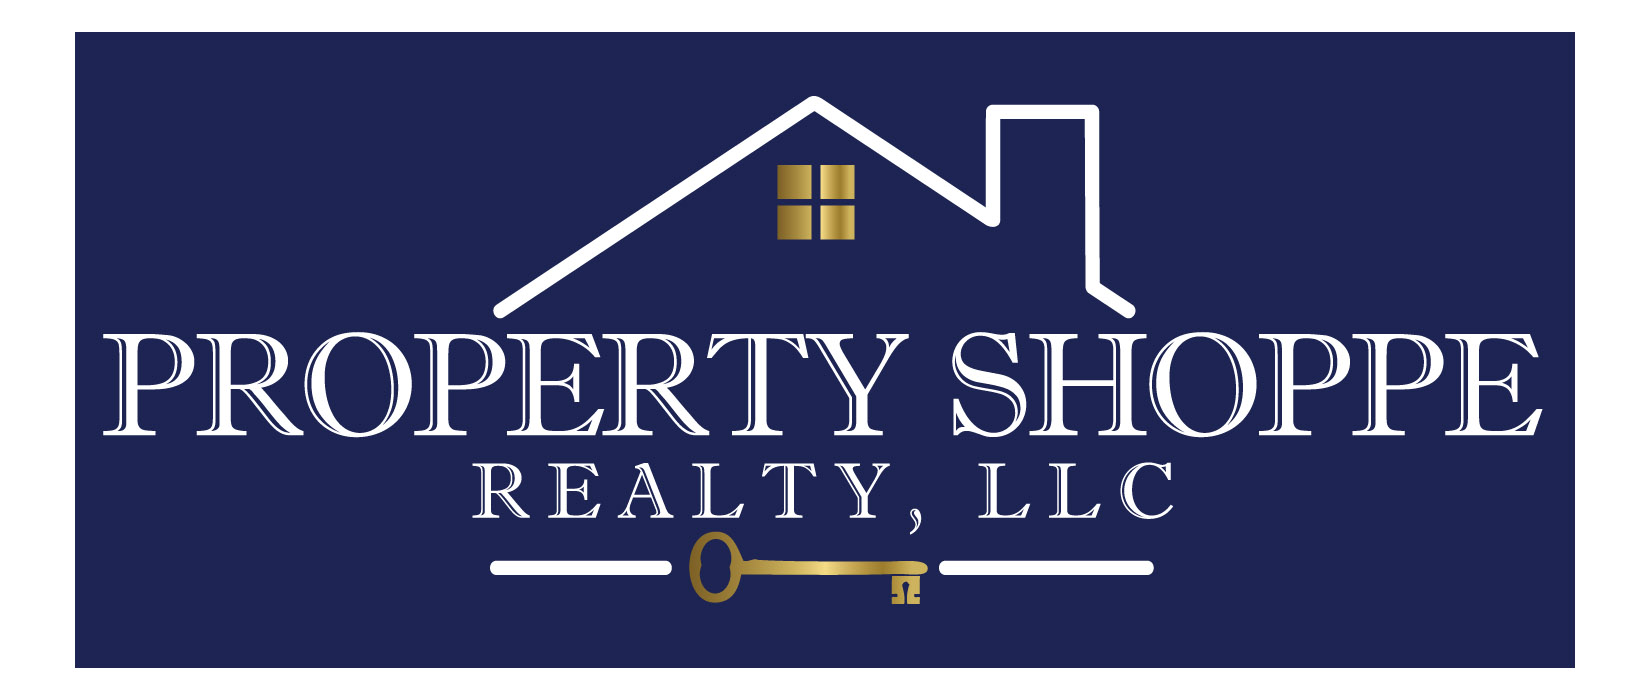 property shoppe logo blue .jpg